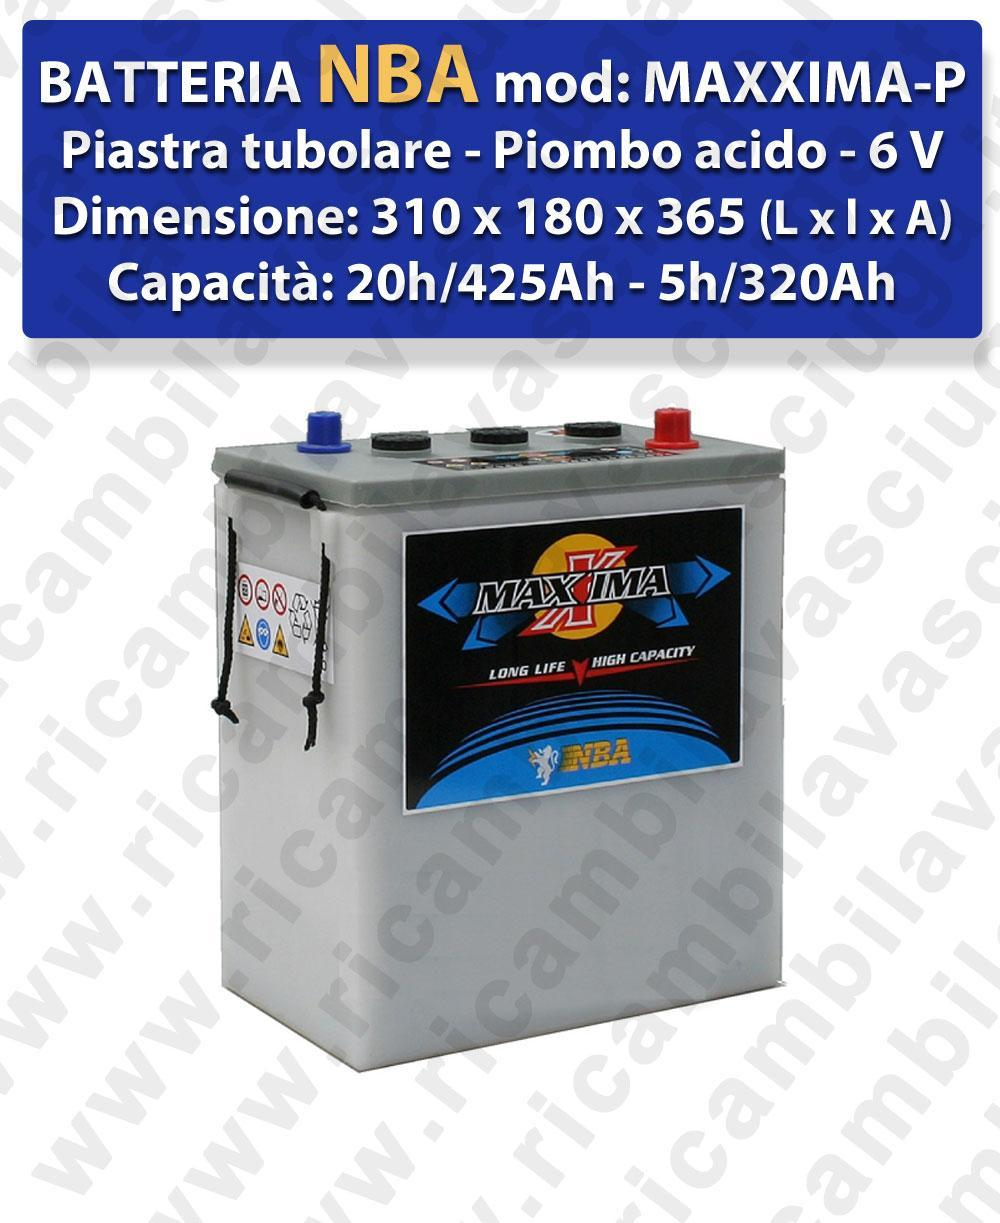 MAXXIMA-PLUS Battery piombo - NBA 6V 425Ah 20/h